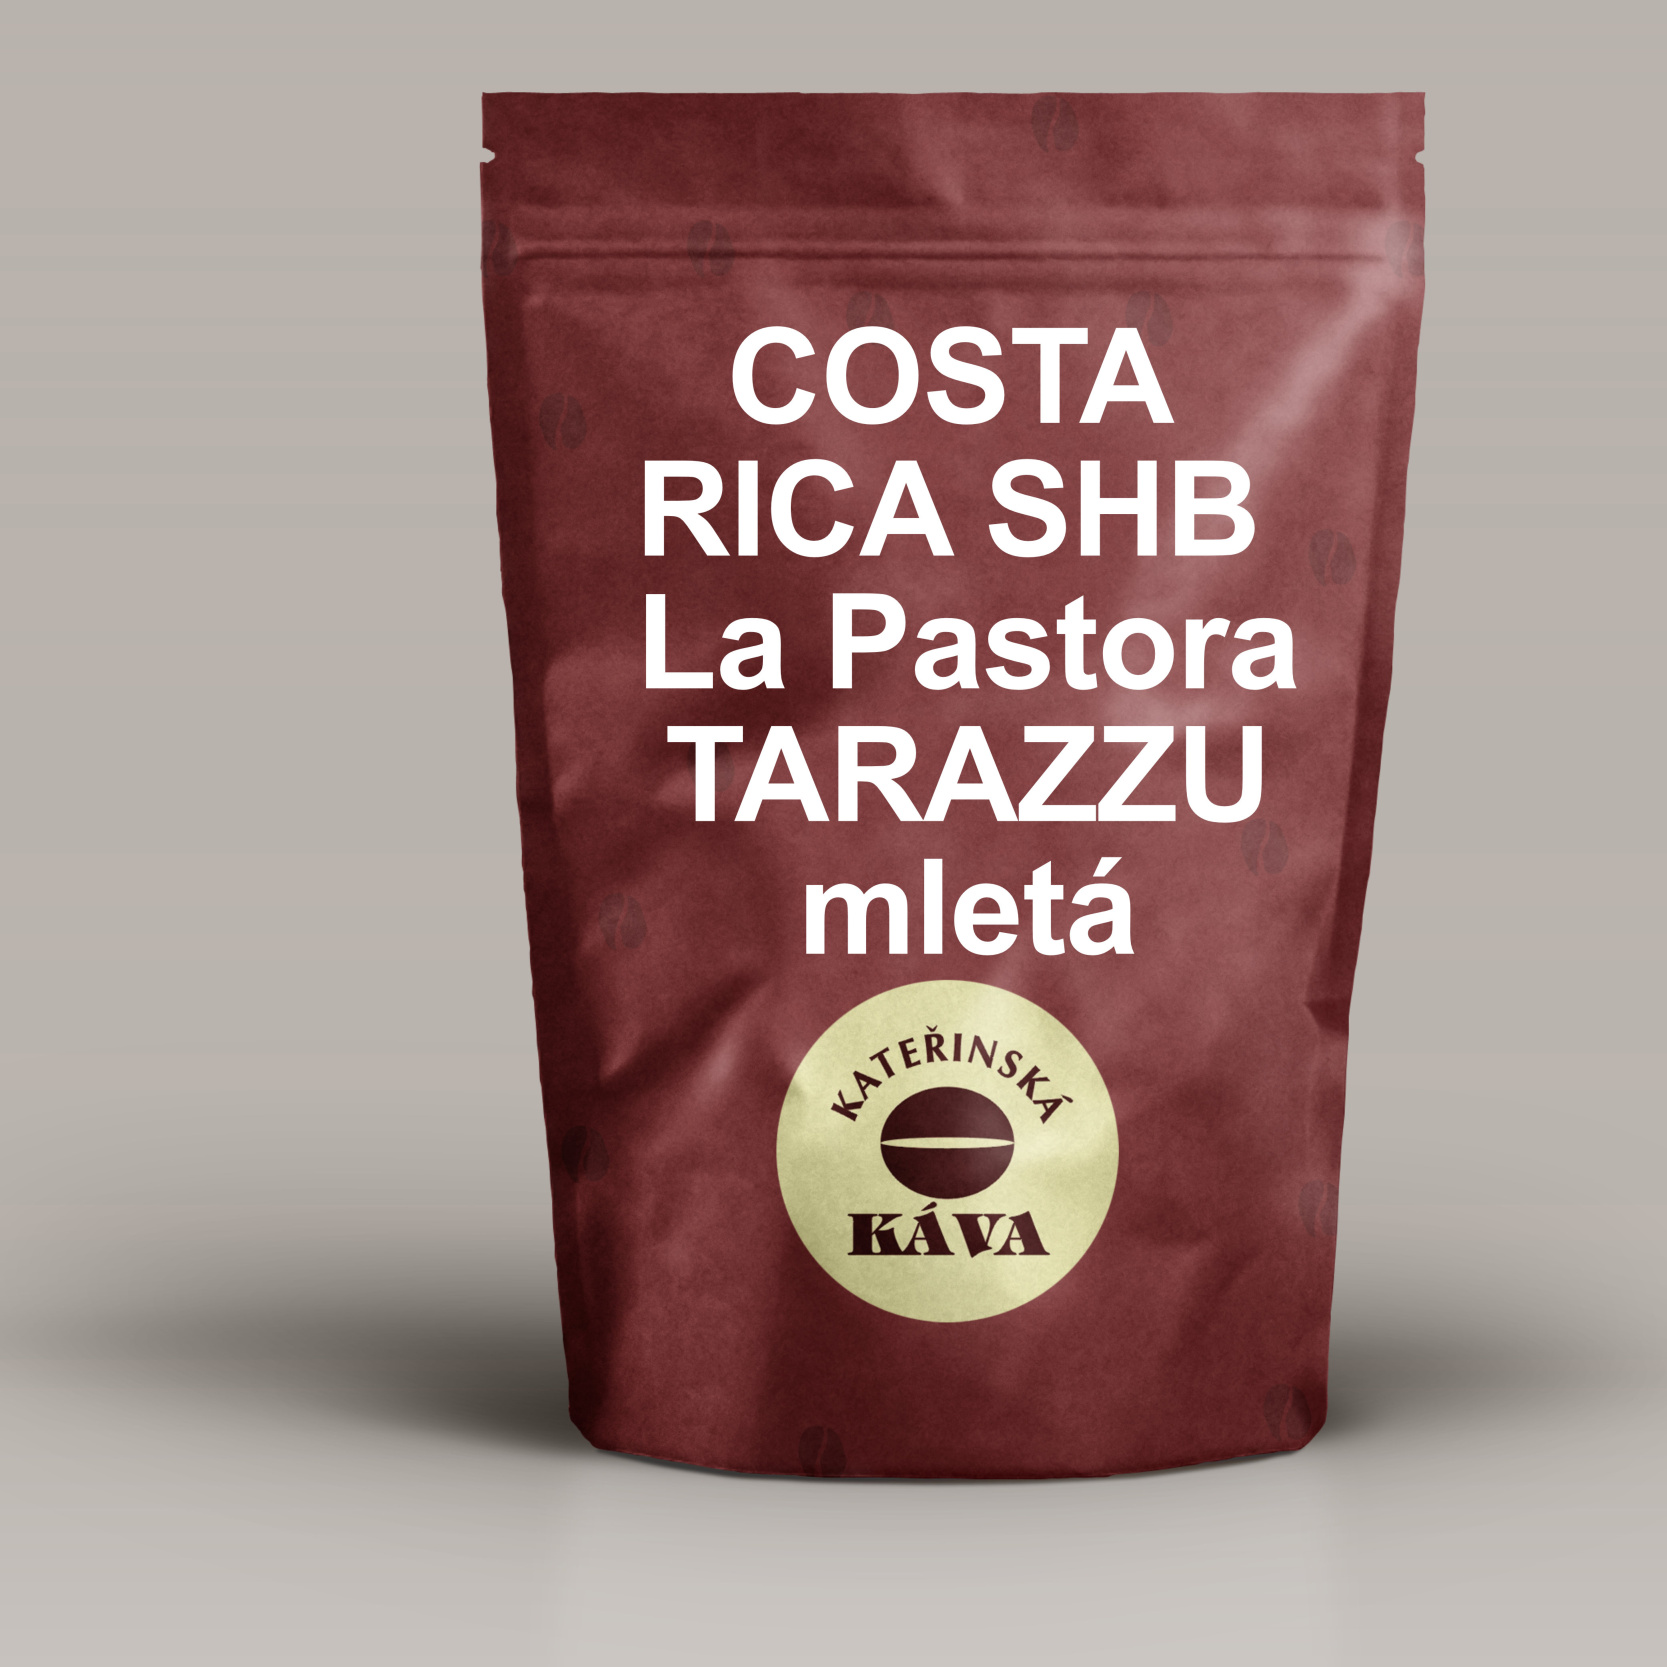 COSTA RICA  SHB La Pastora TARAZZU -mletá